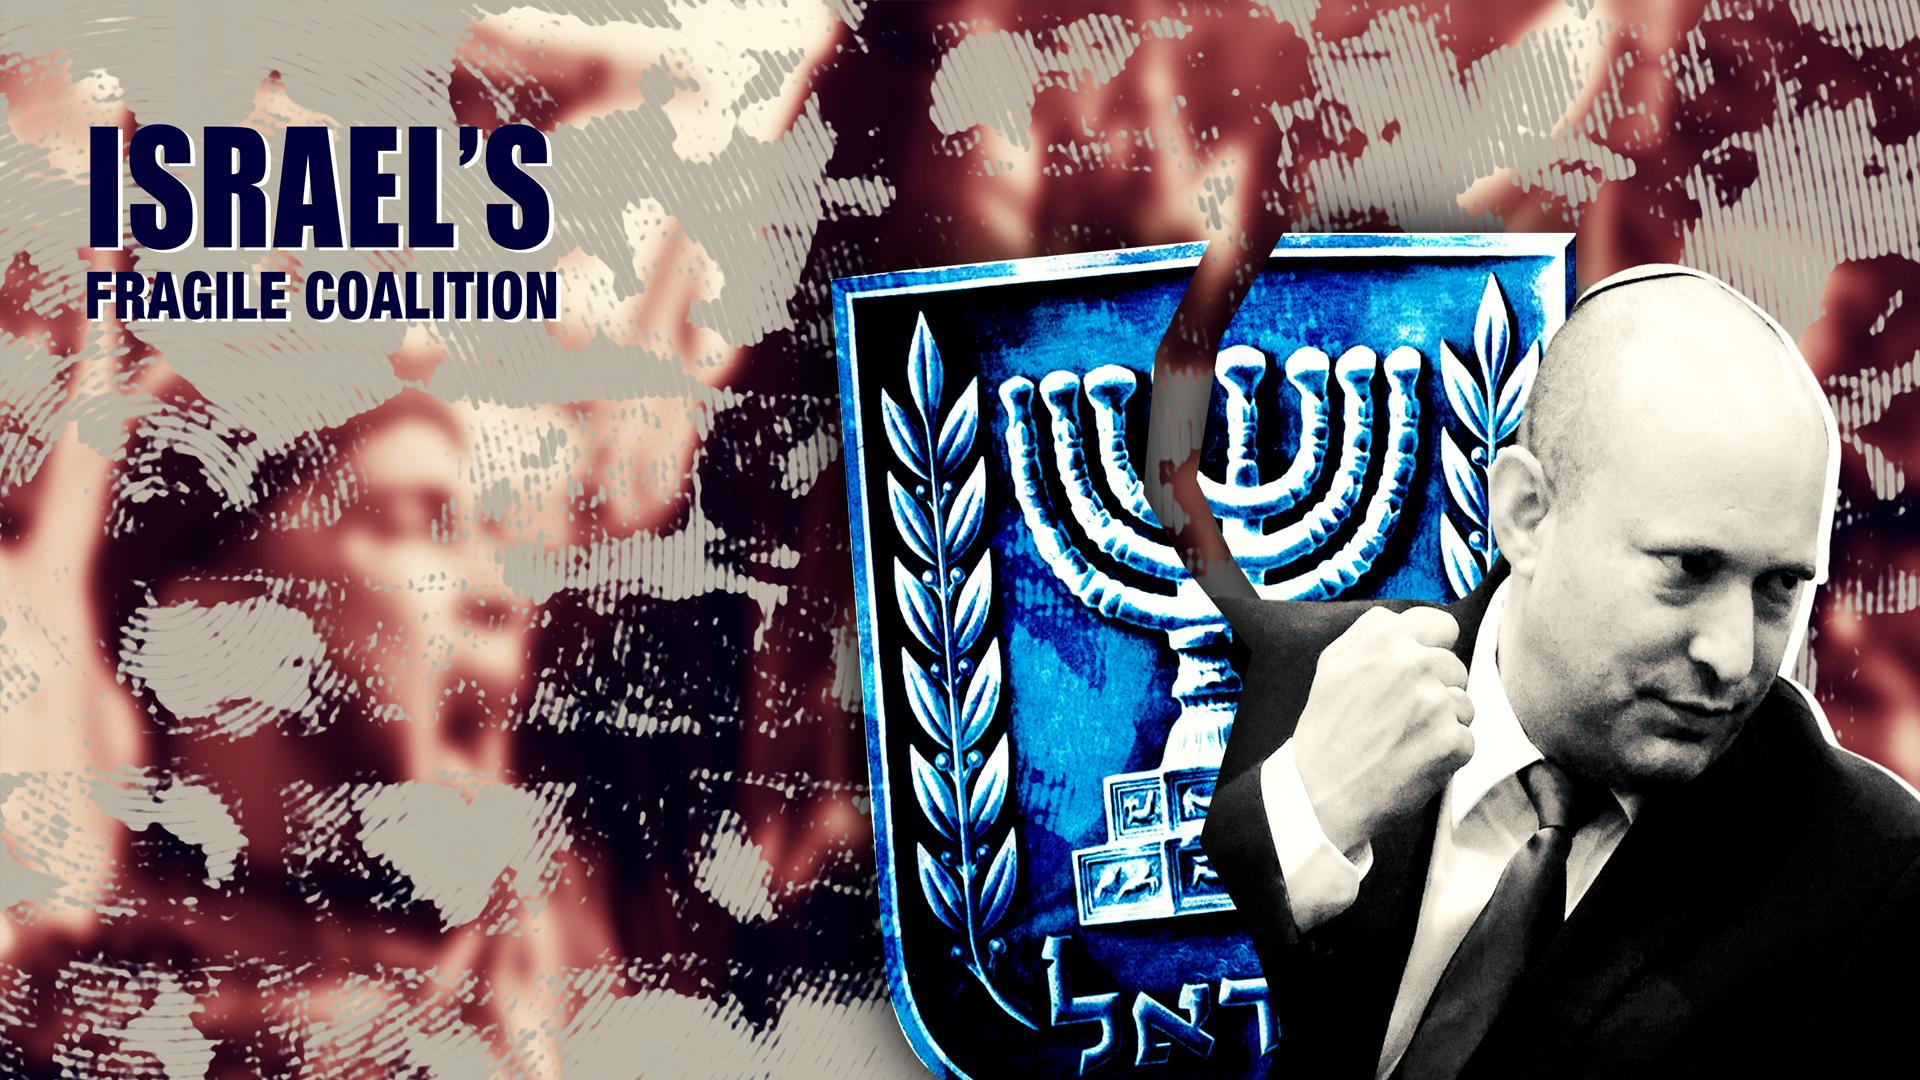 Israel's fragile coalition